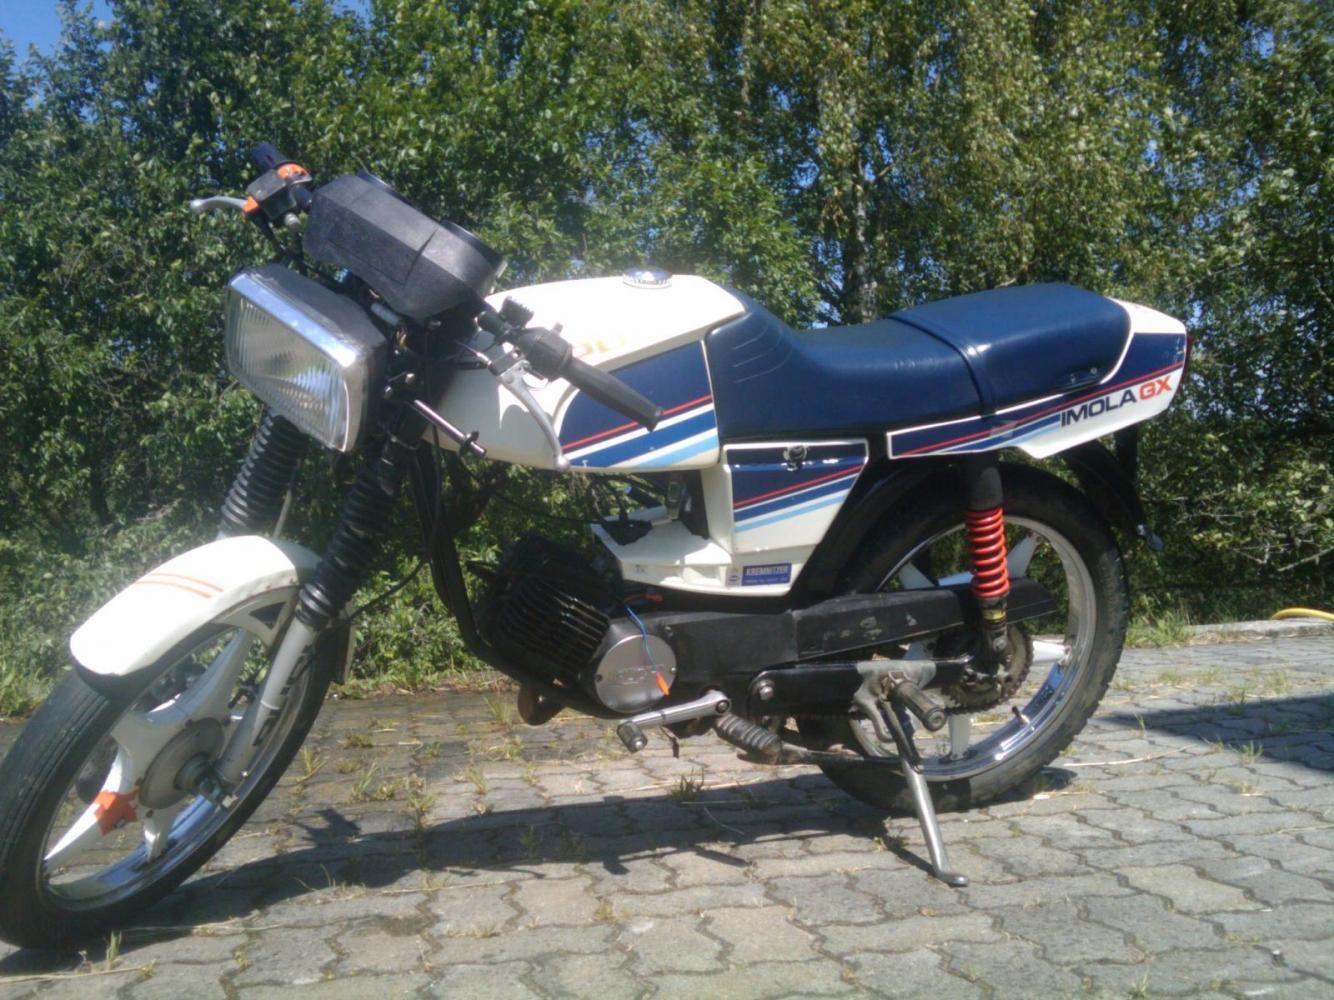 puch imola gx 50 1994